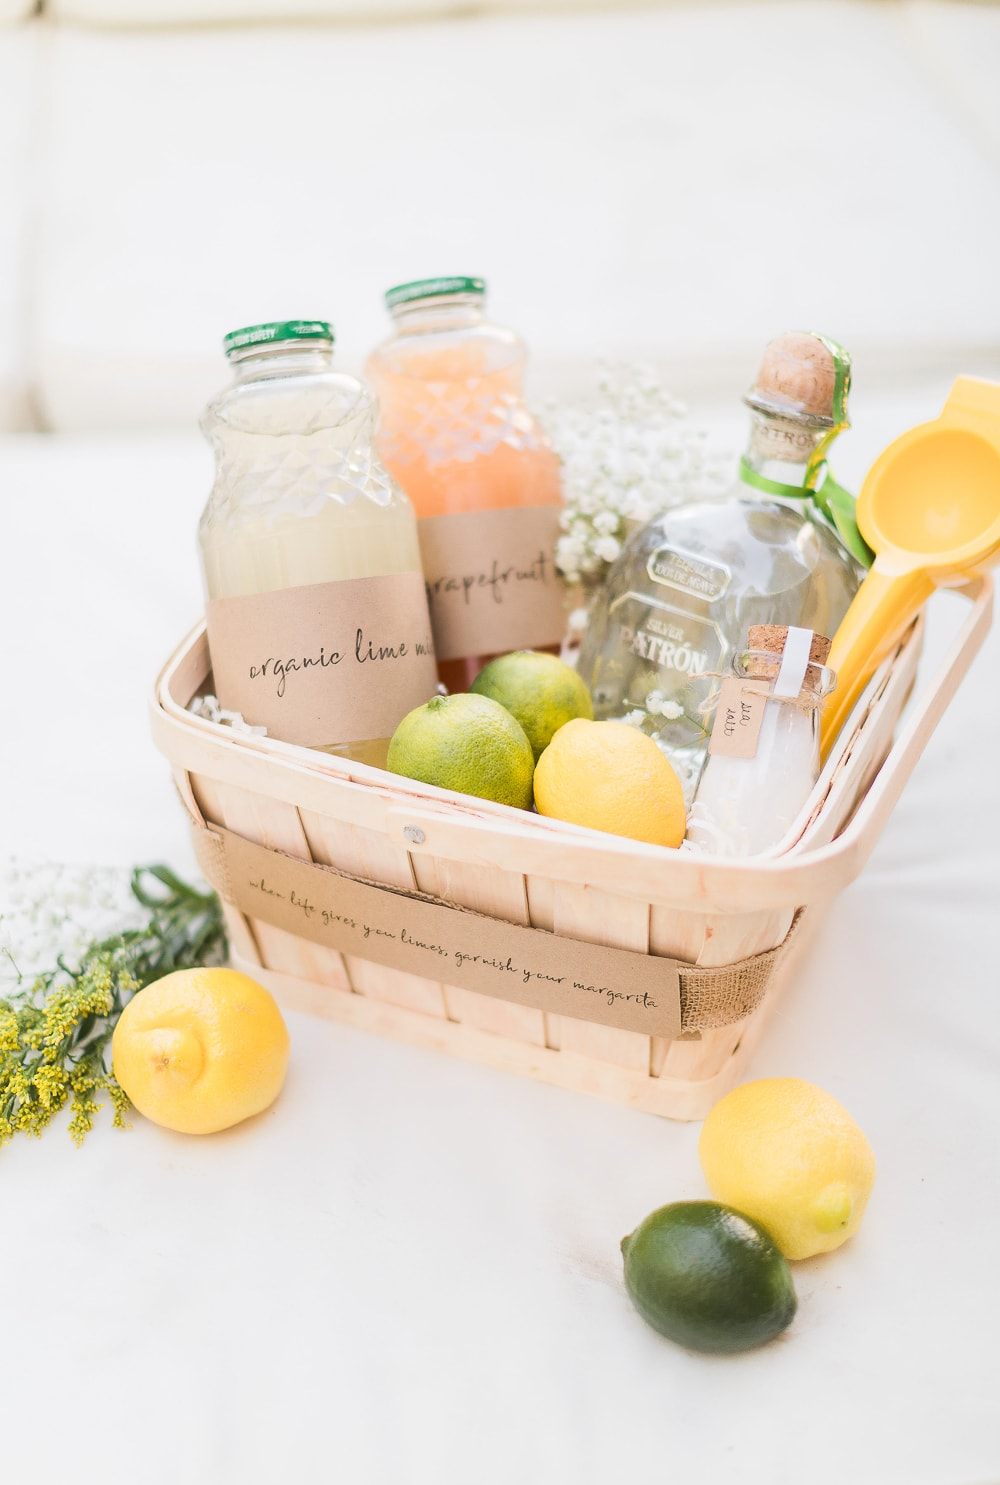 Blogger Stephanie Ziajka shares a DIY margarita gift basket on Diary of a Debutante